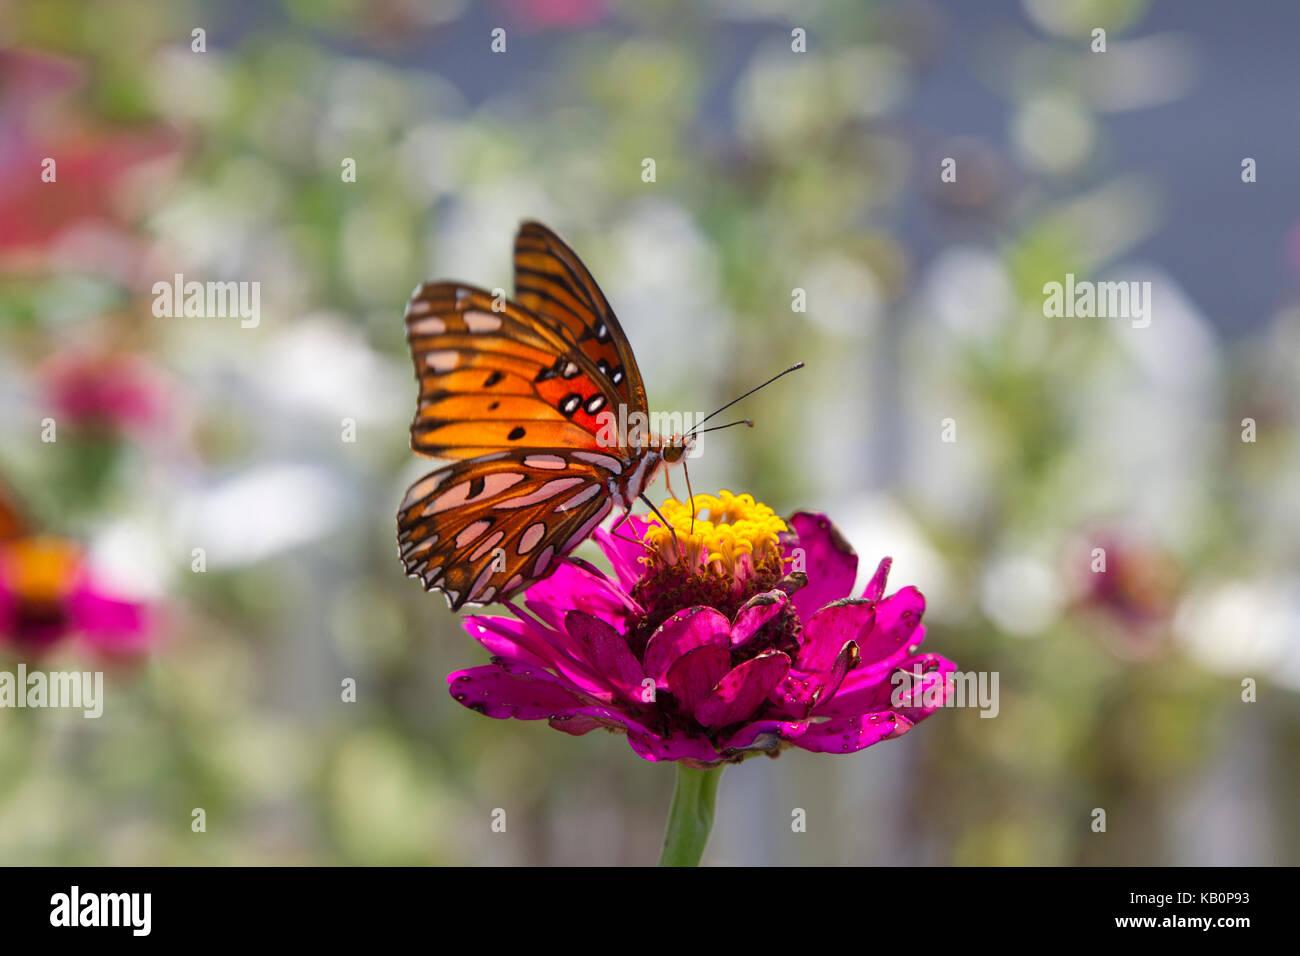 Golfo speyeria mariposa sobre flor magenta Imagen De Stock